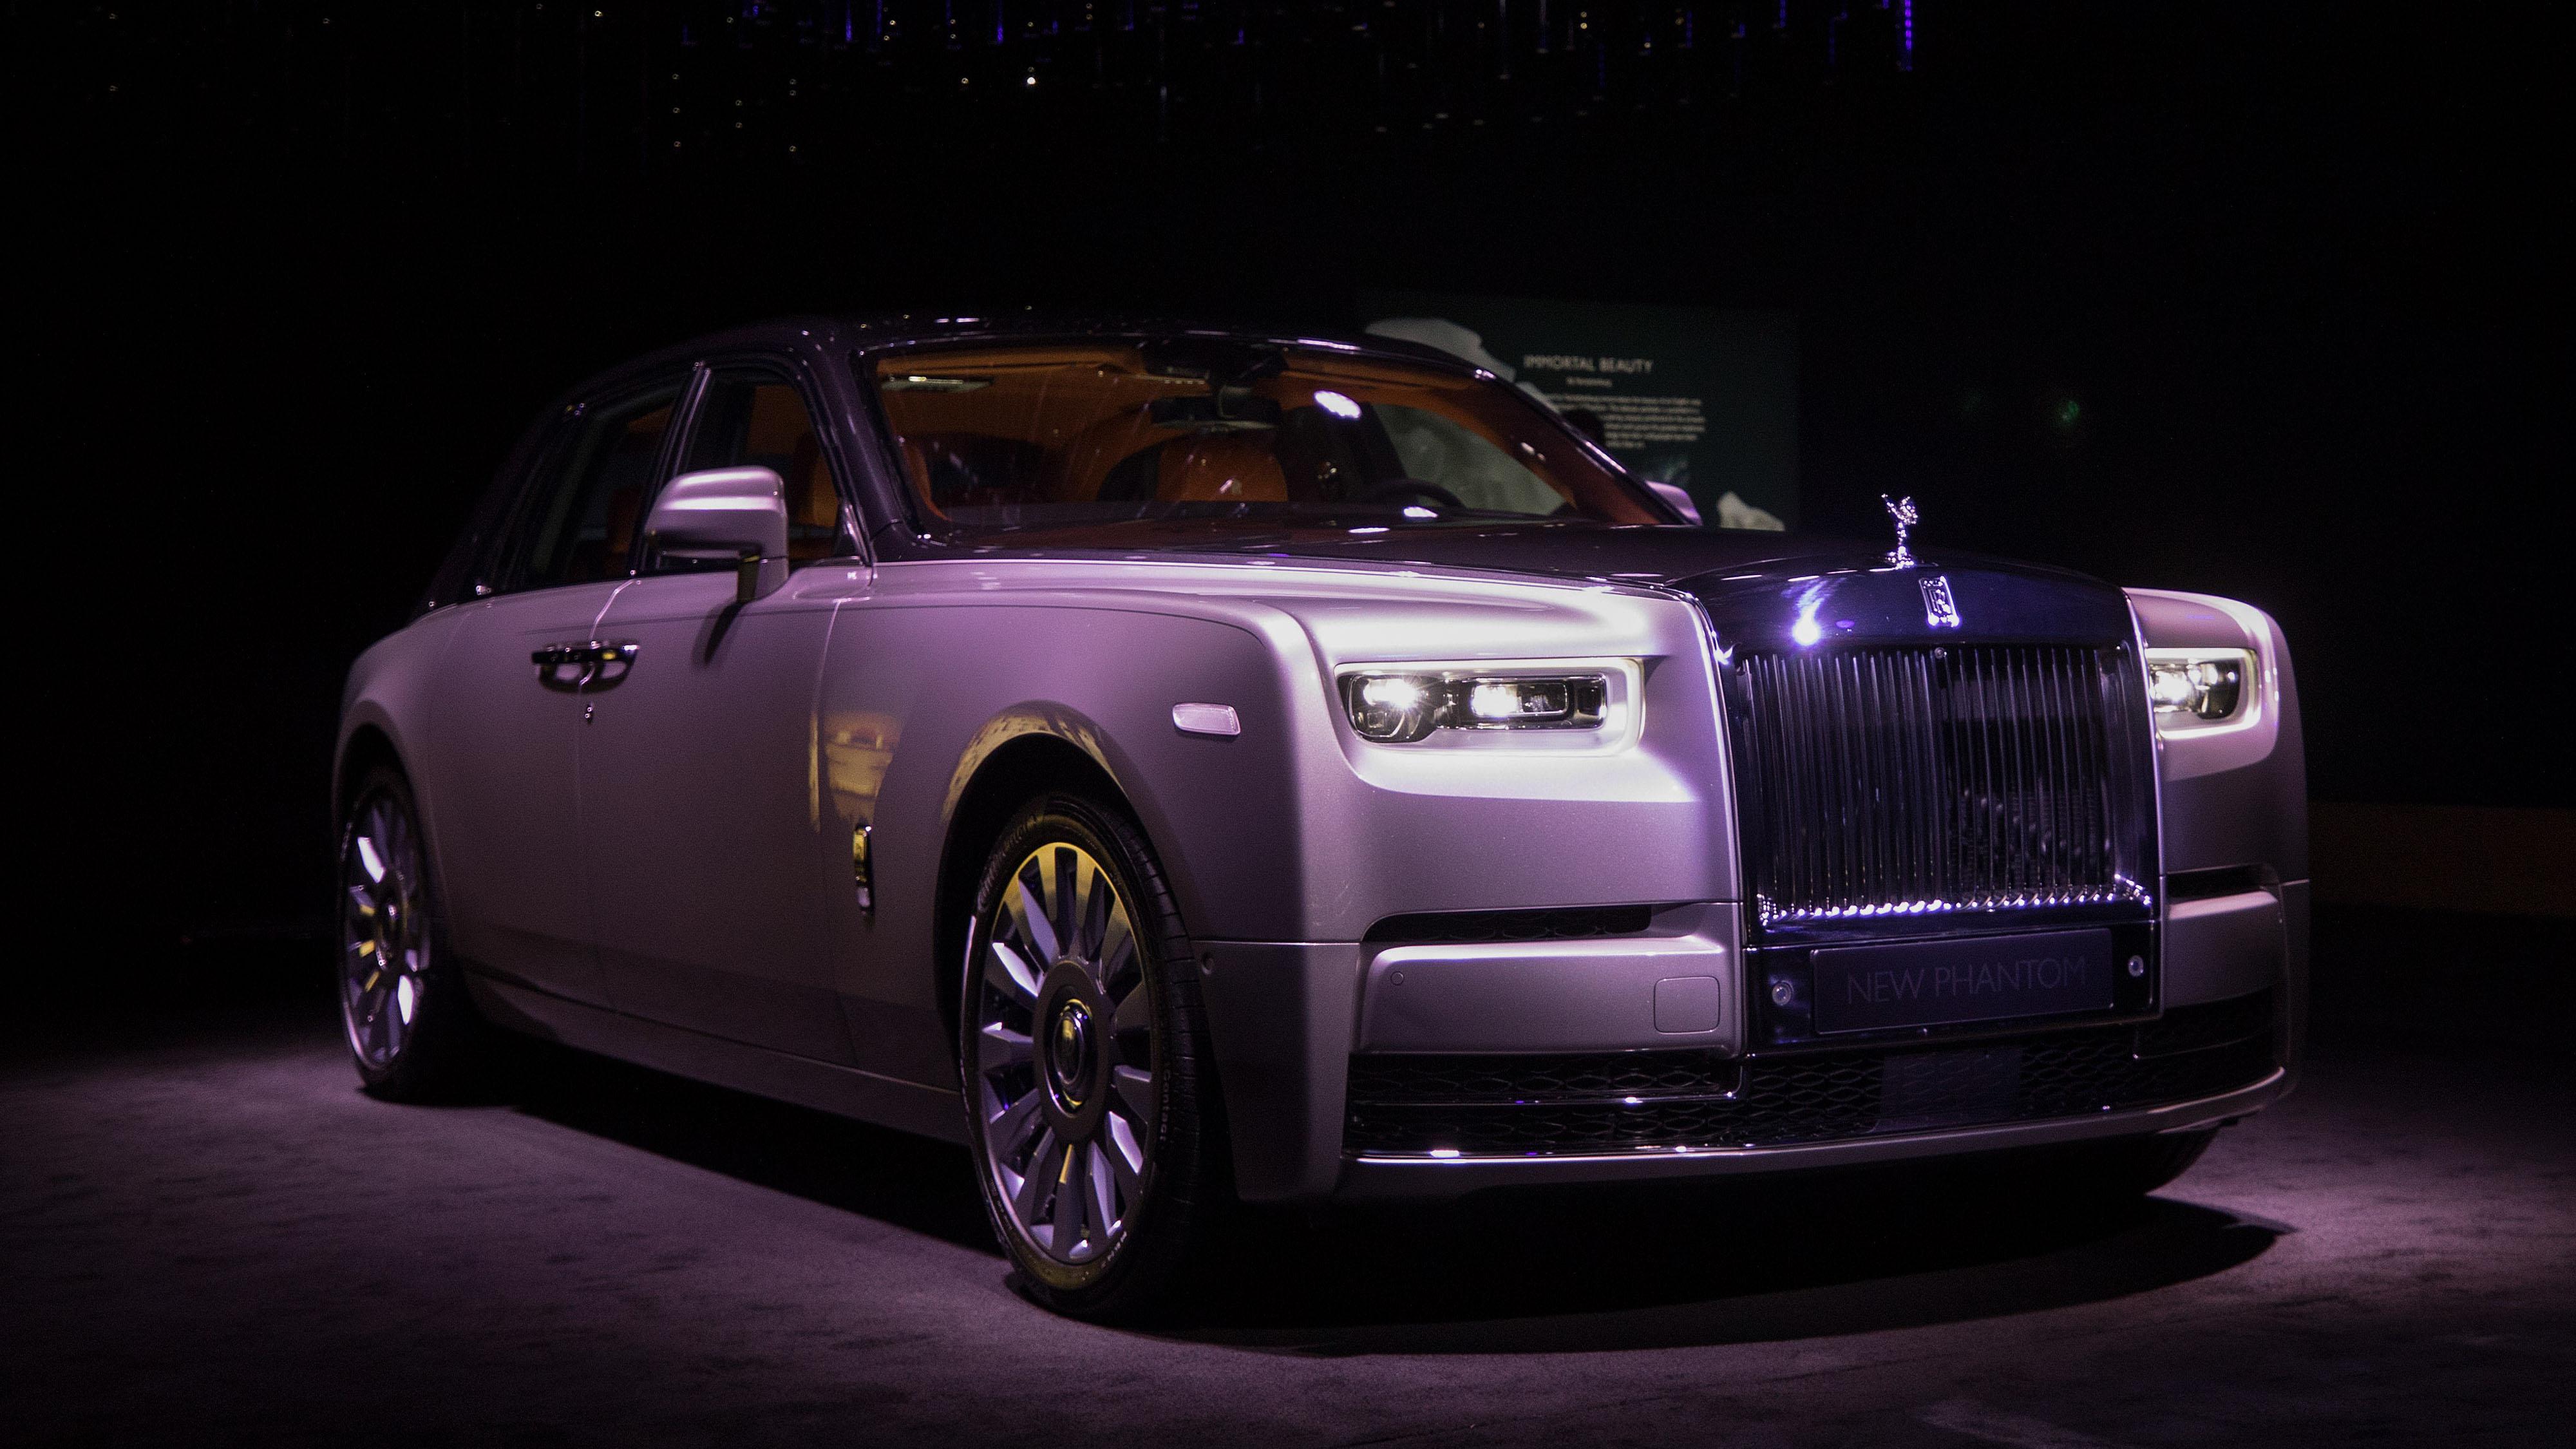 Rolls-Royce Phantom VIII Specs, Design, Speed - Bloomberg